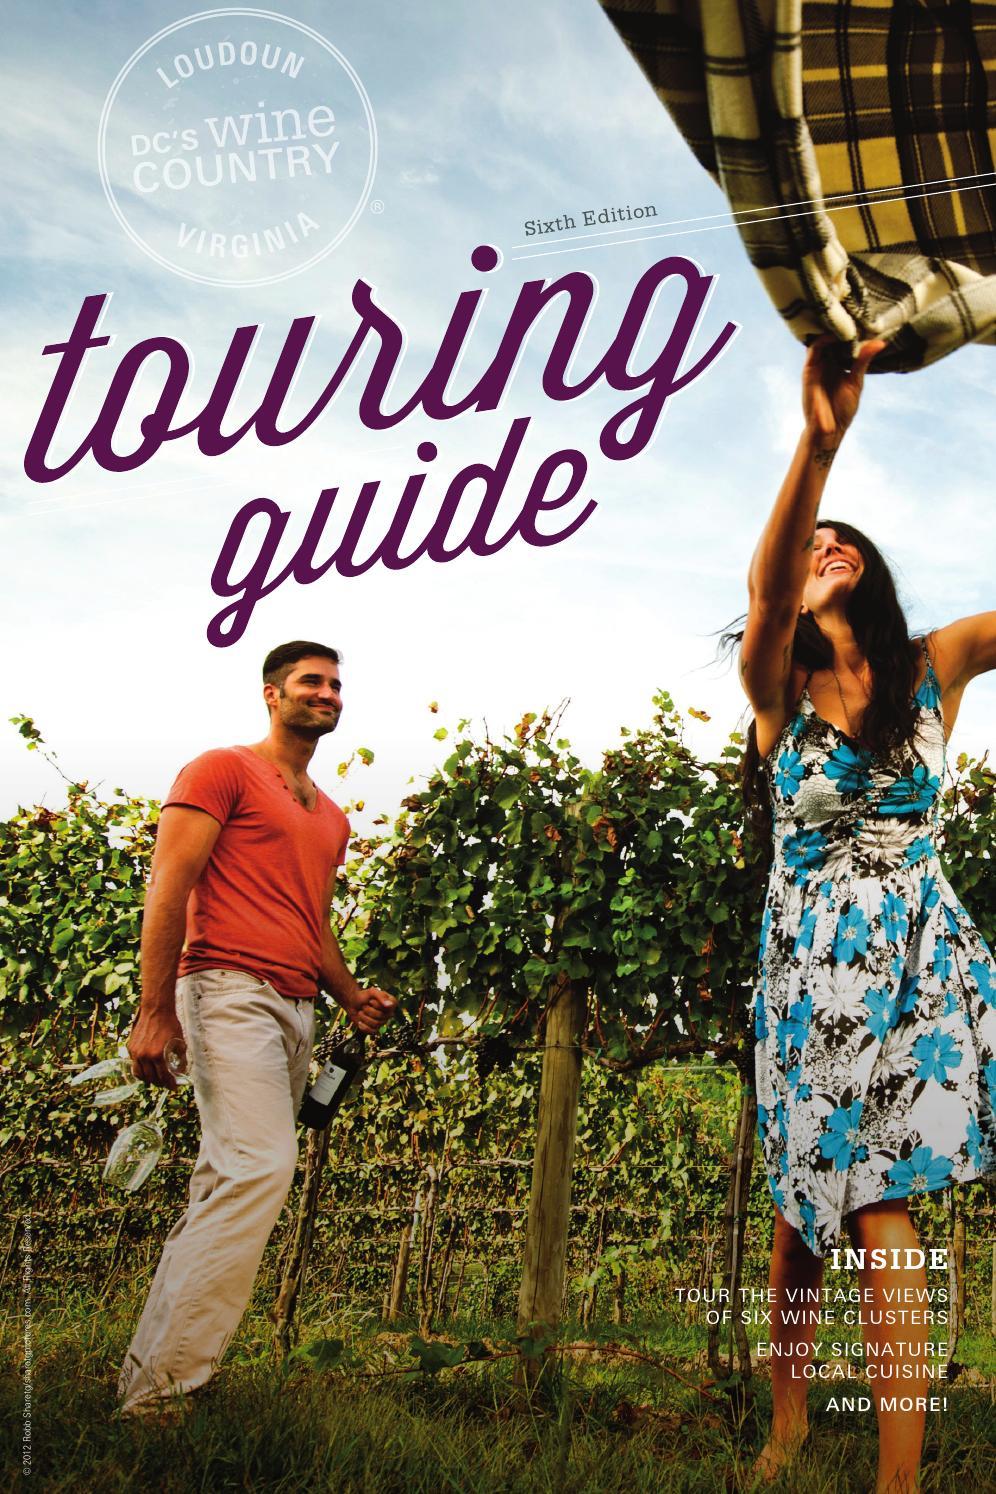 Touring Washington State Wine Country